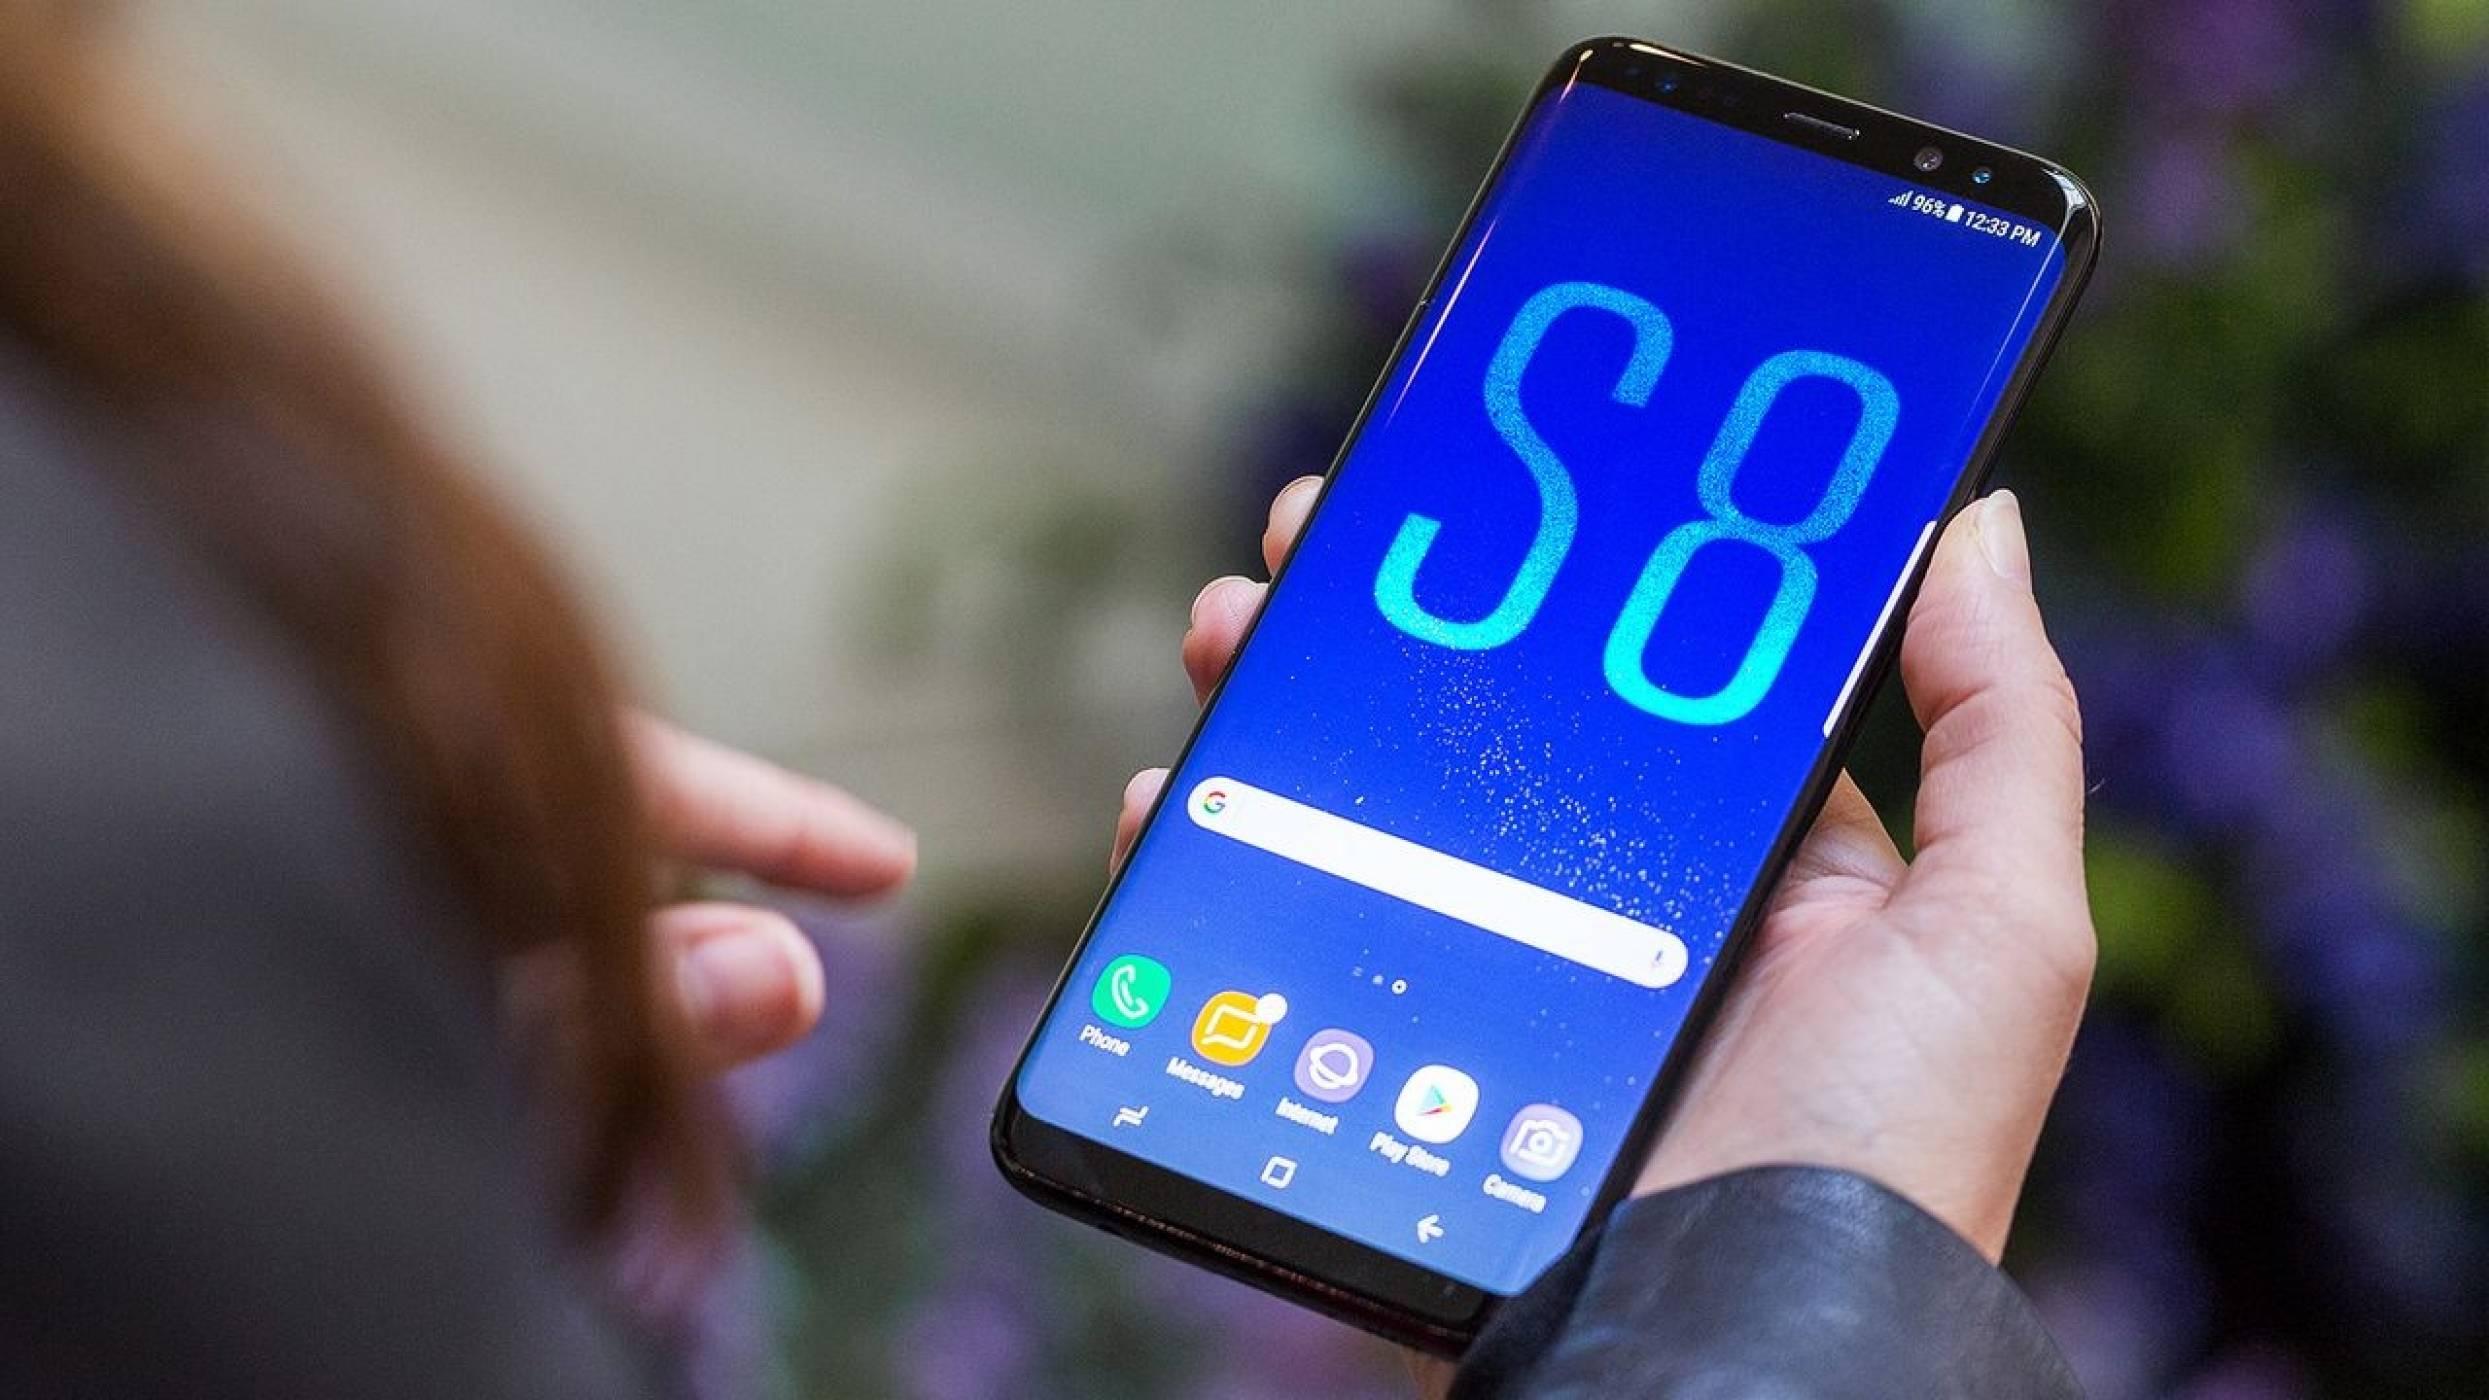 Samsung доставила над 20 млн. Galaxy S8 смартфона, твърди Strategy Analytics